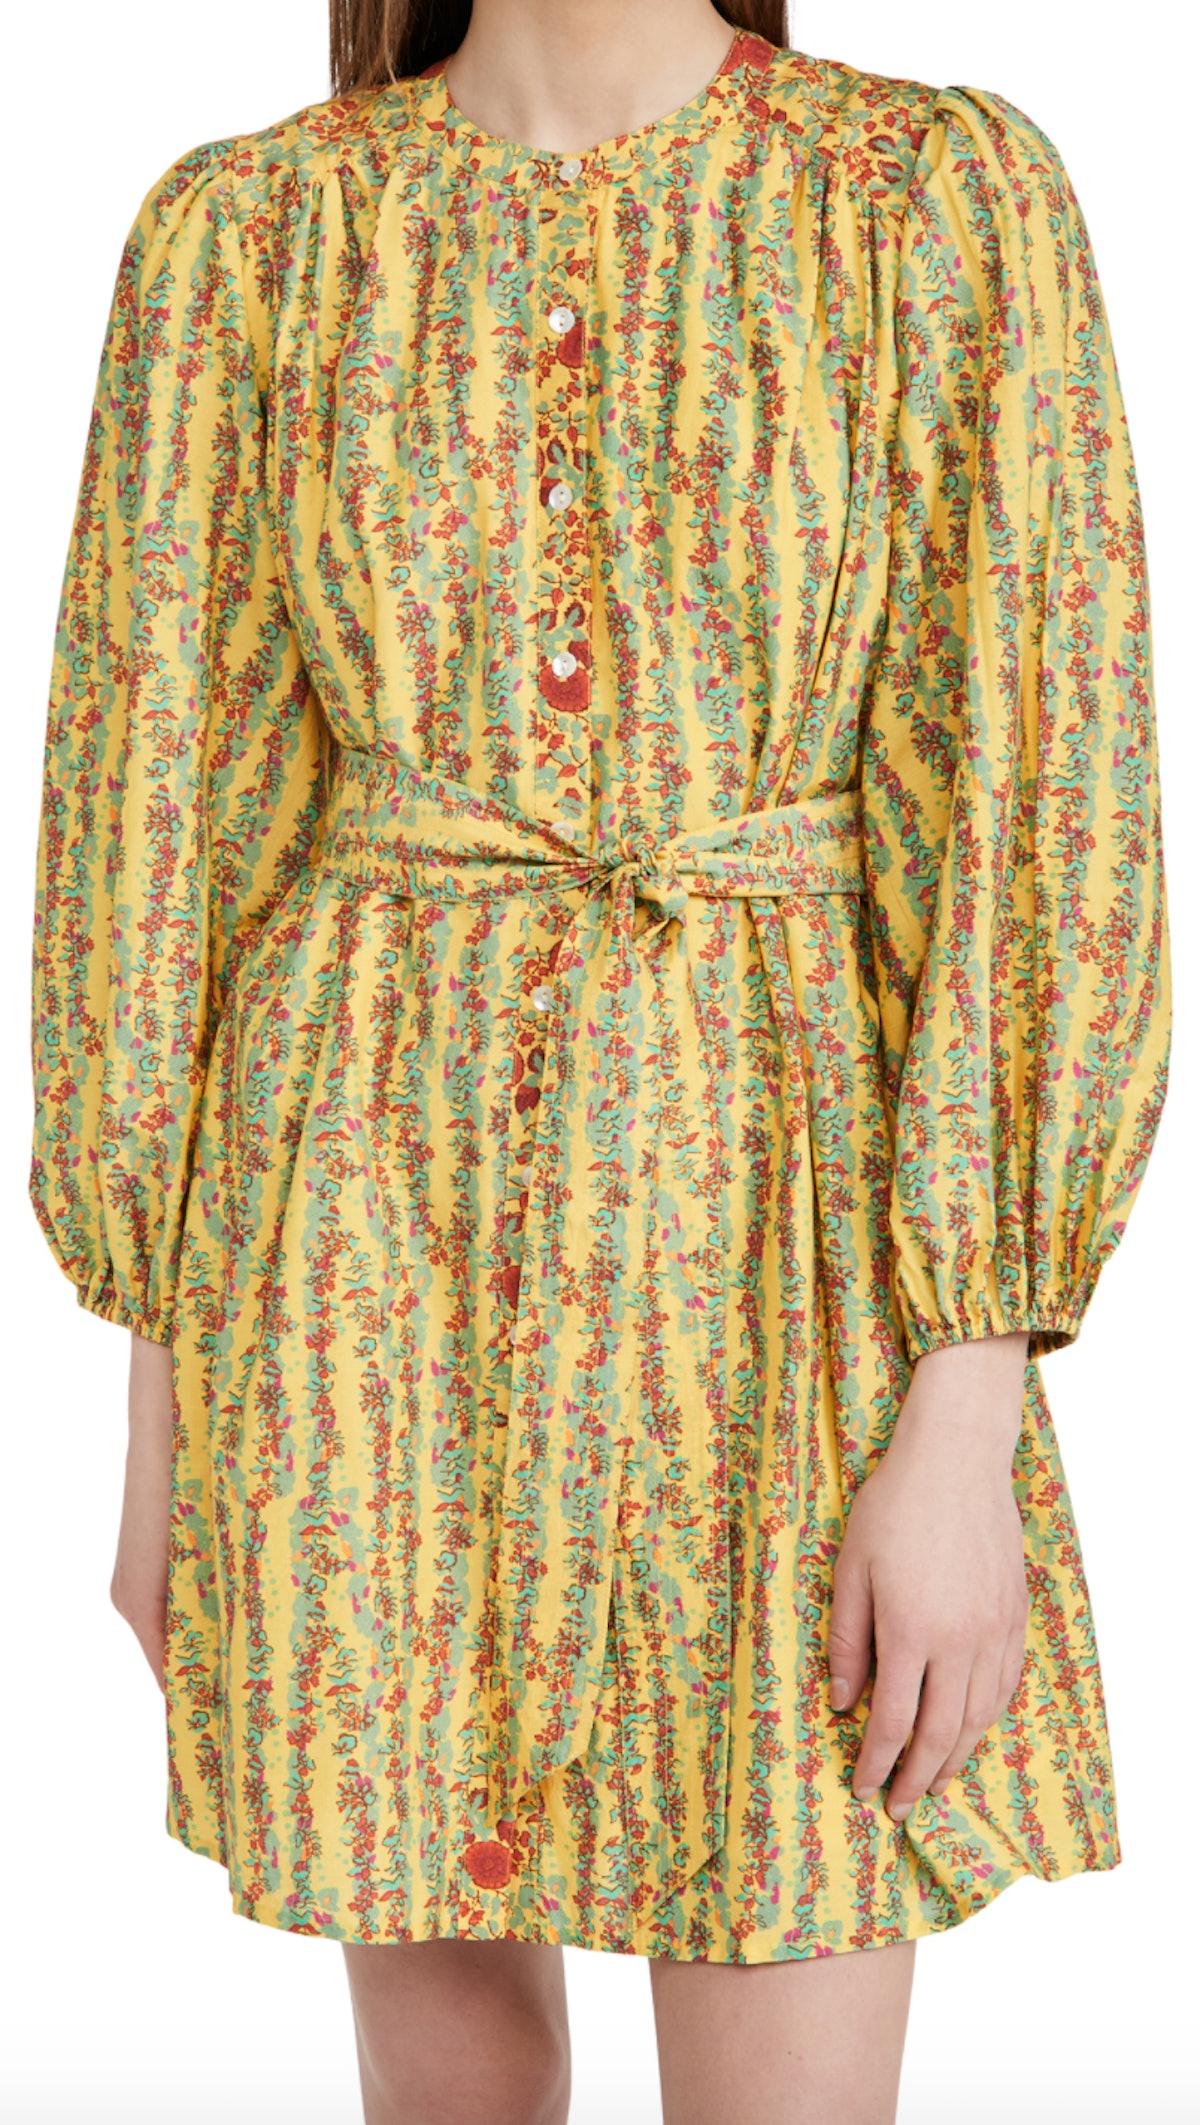 Rhody Stripe Evita Dress